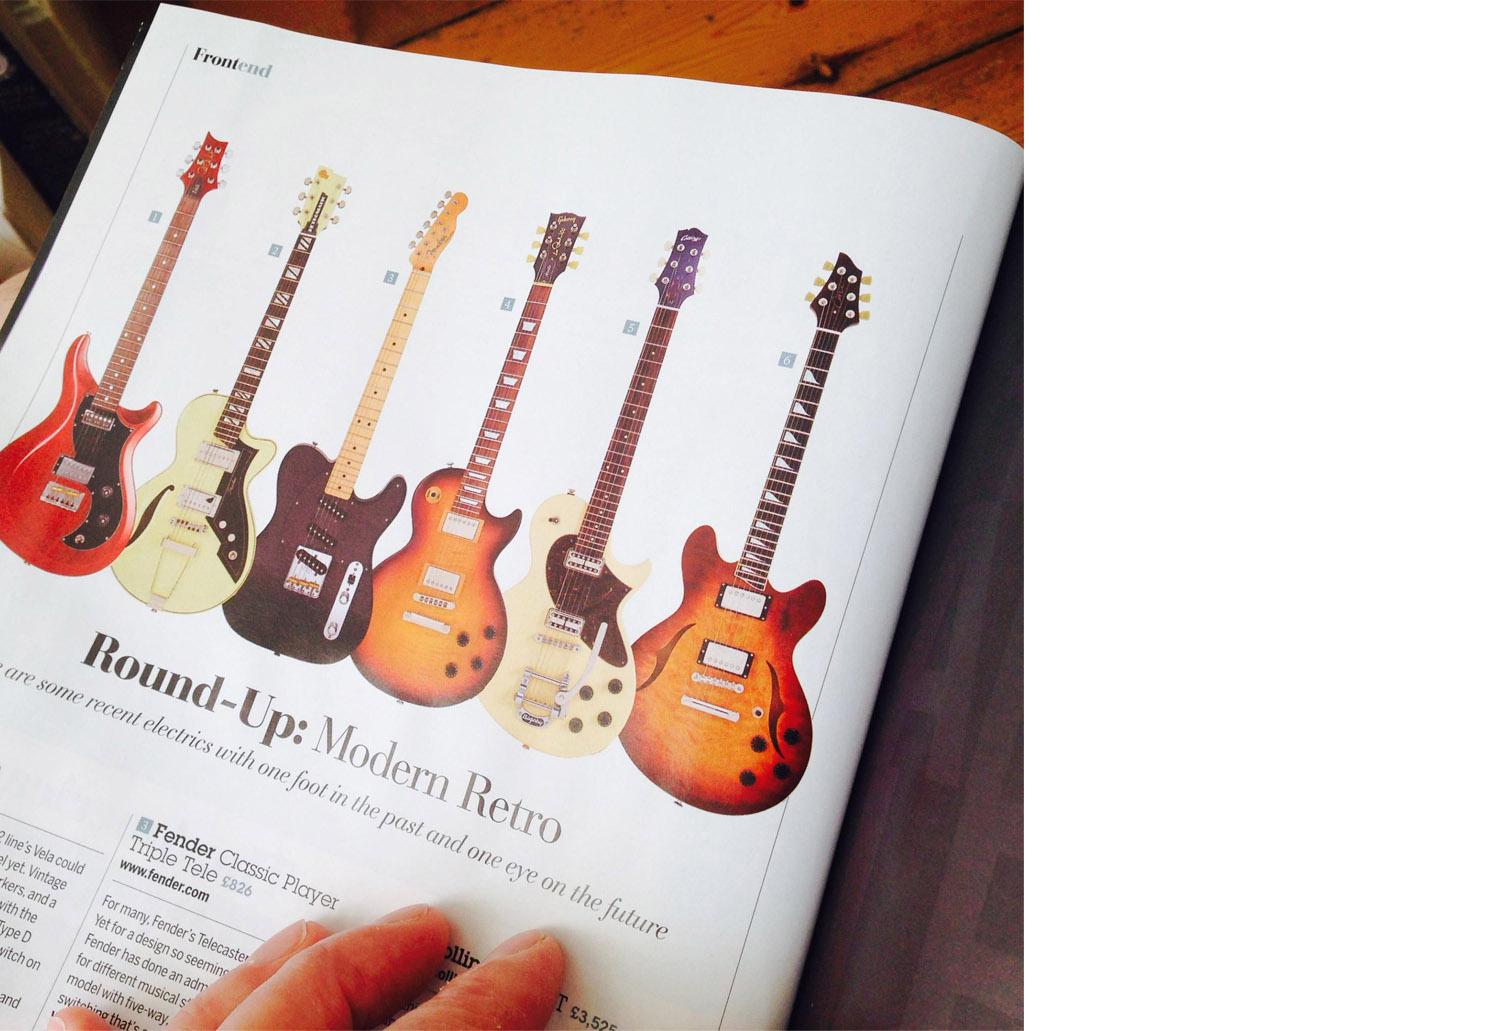 J25 Semi-hollow in Guitarist magazine